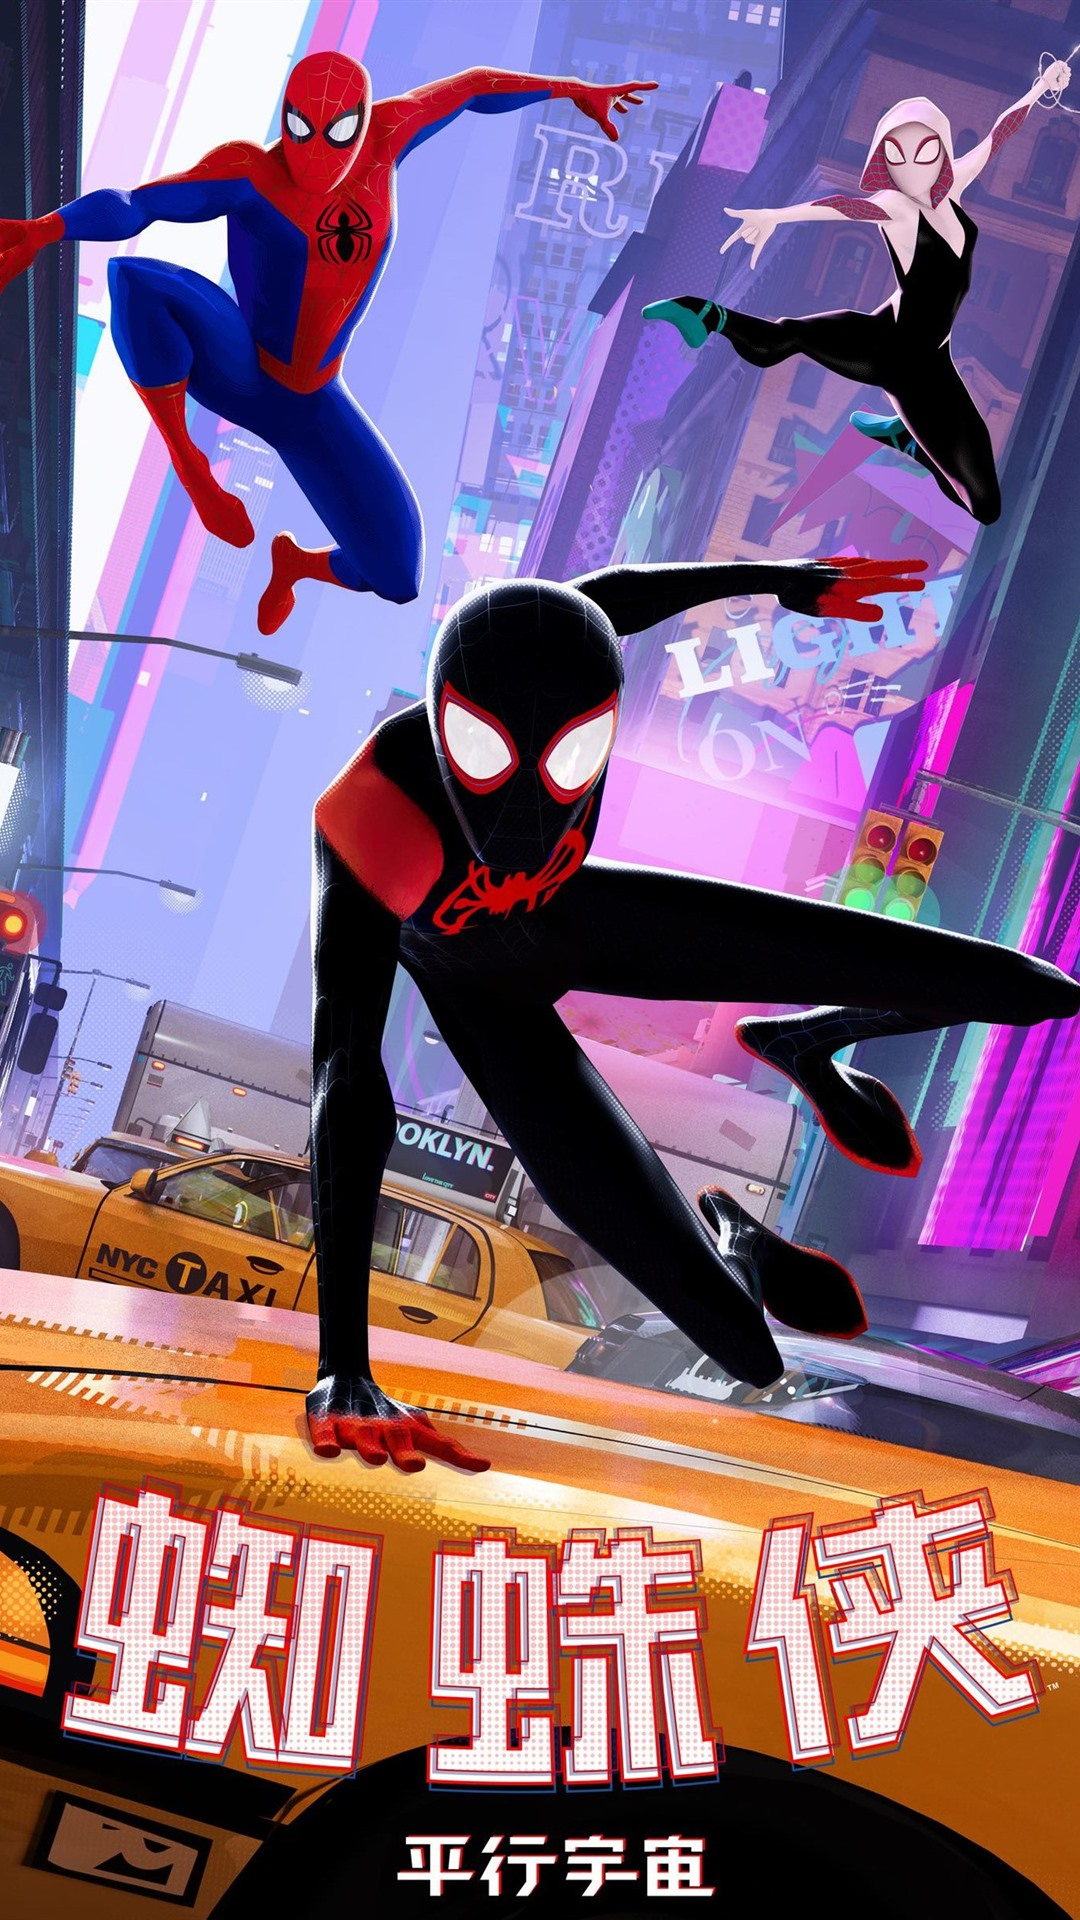 Wallpaper Spider Man Into The Spider Verse Anime Movie 2018